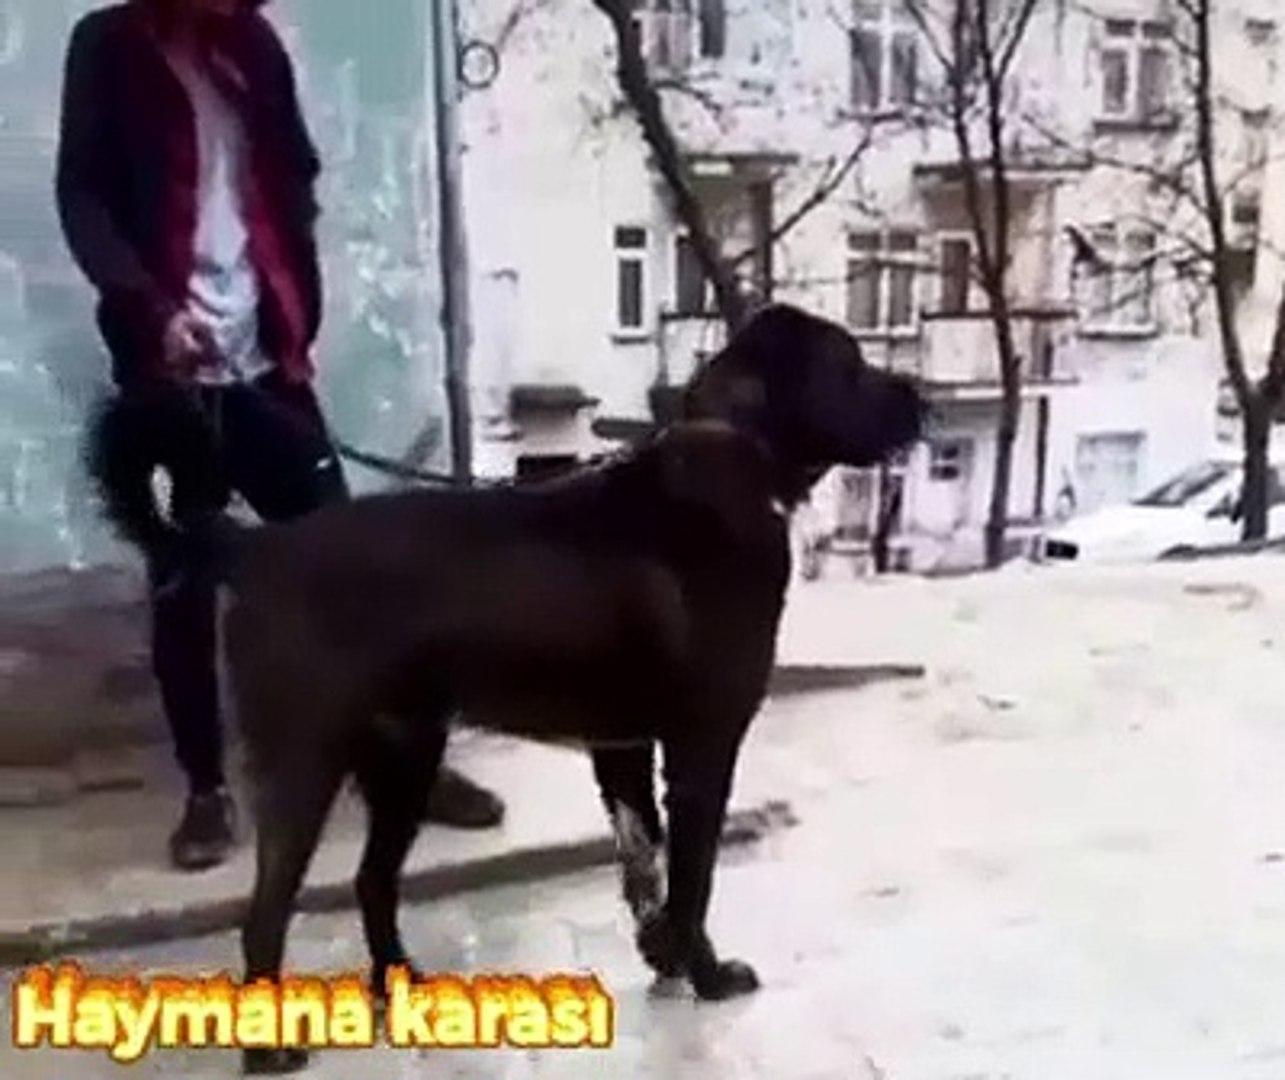 ANADOLUNUN KARA EJDERHASI - BLACK ANATOLiAN SHEPHERD DOG